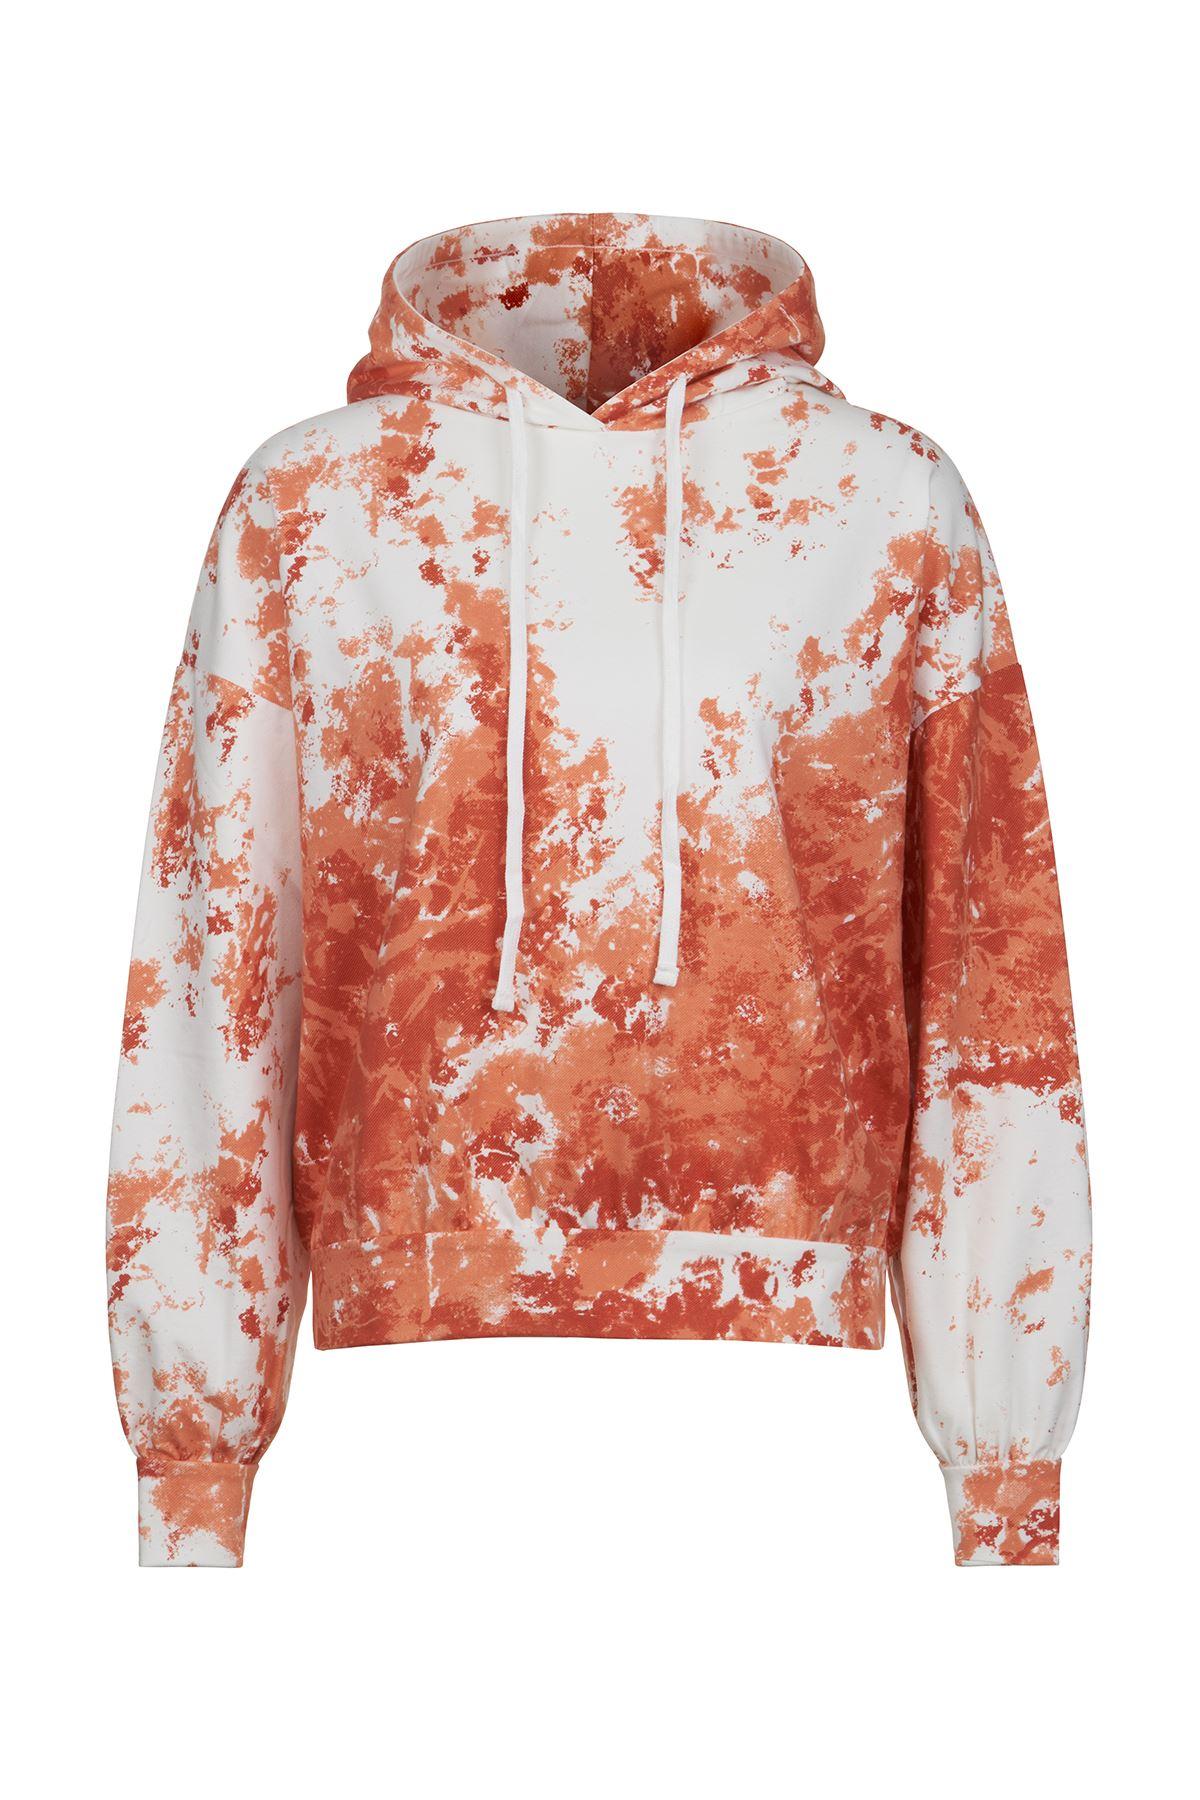 Turuncu Batik Sweatshirt